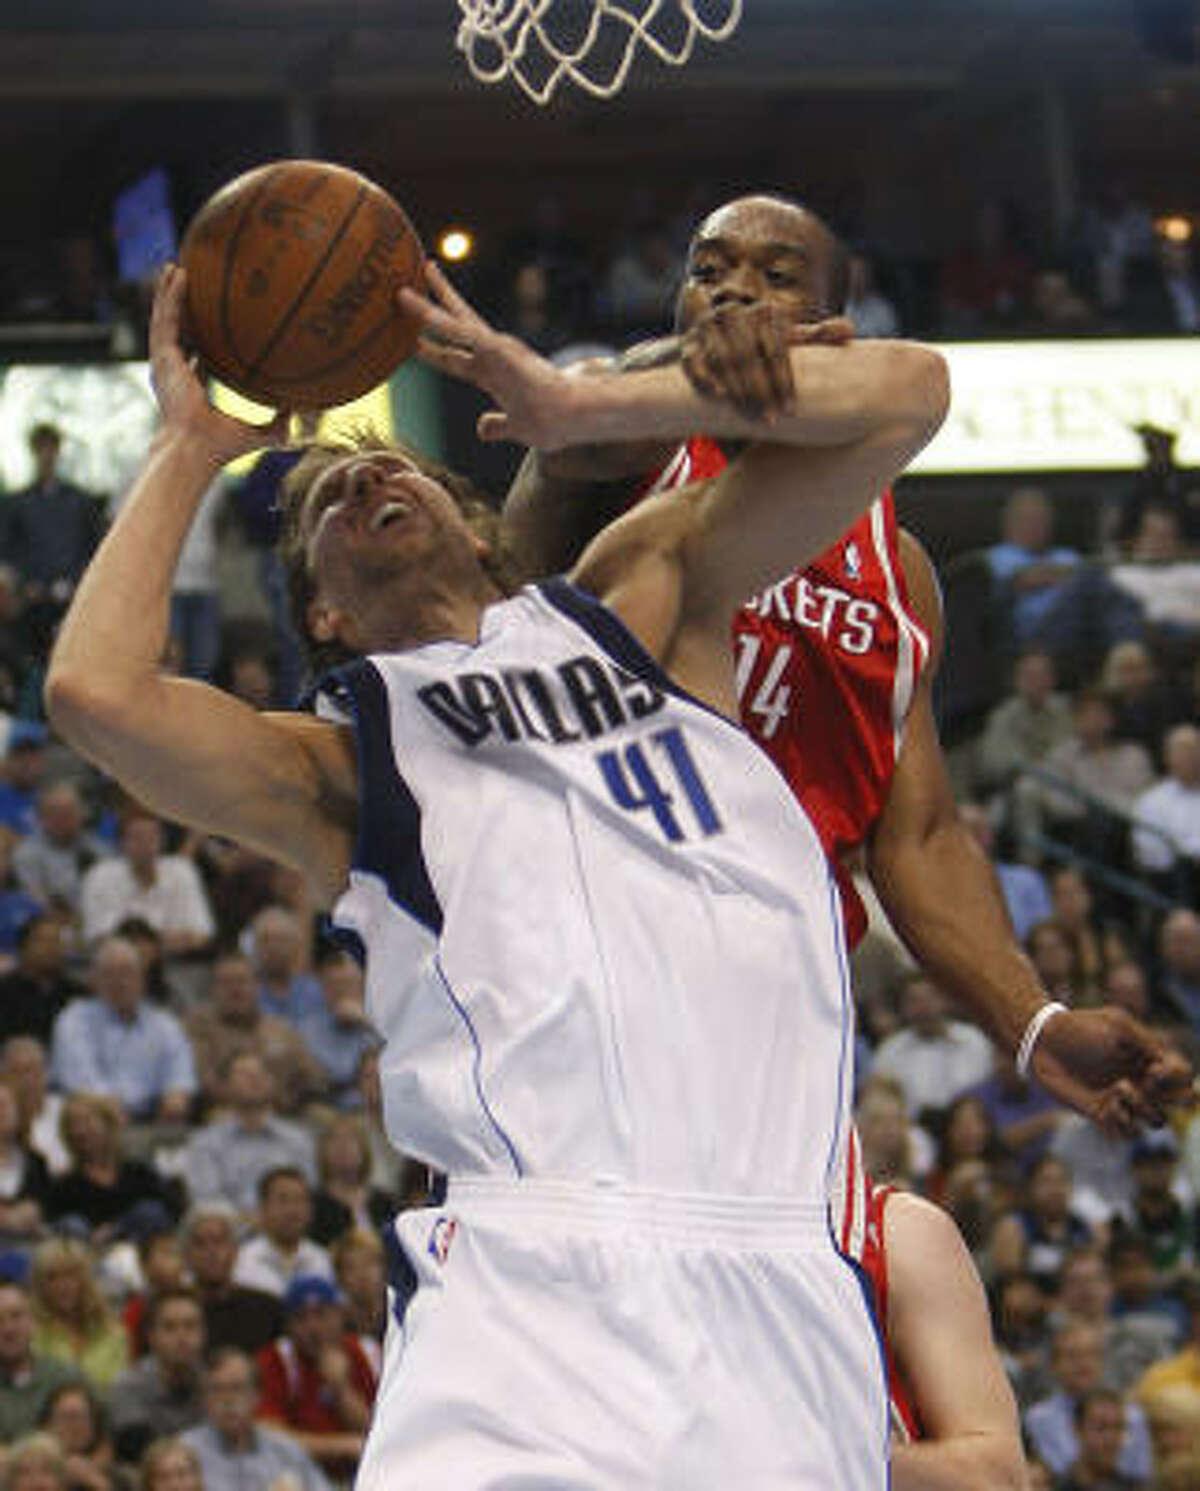 The Rockets' Carl Landry fouls Mavericks Dirk Nowitzki under the basket in the first quarter.